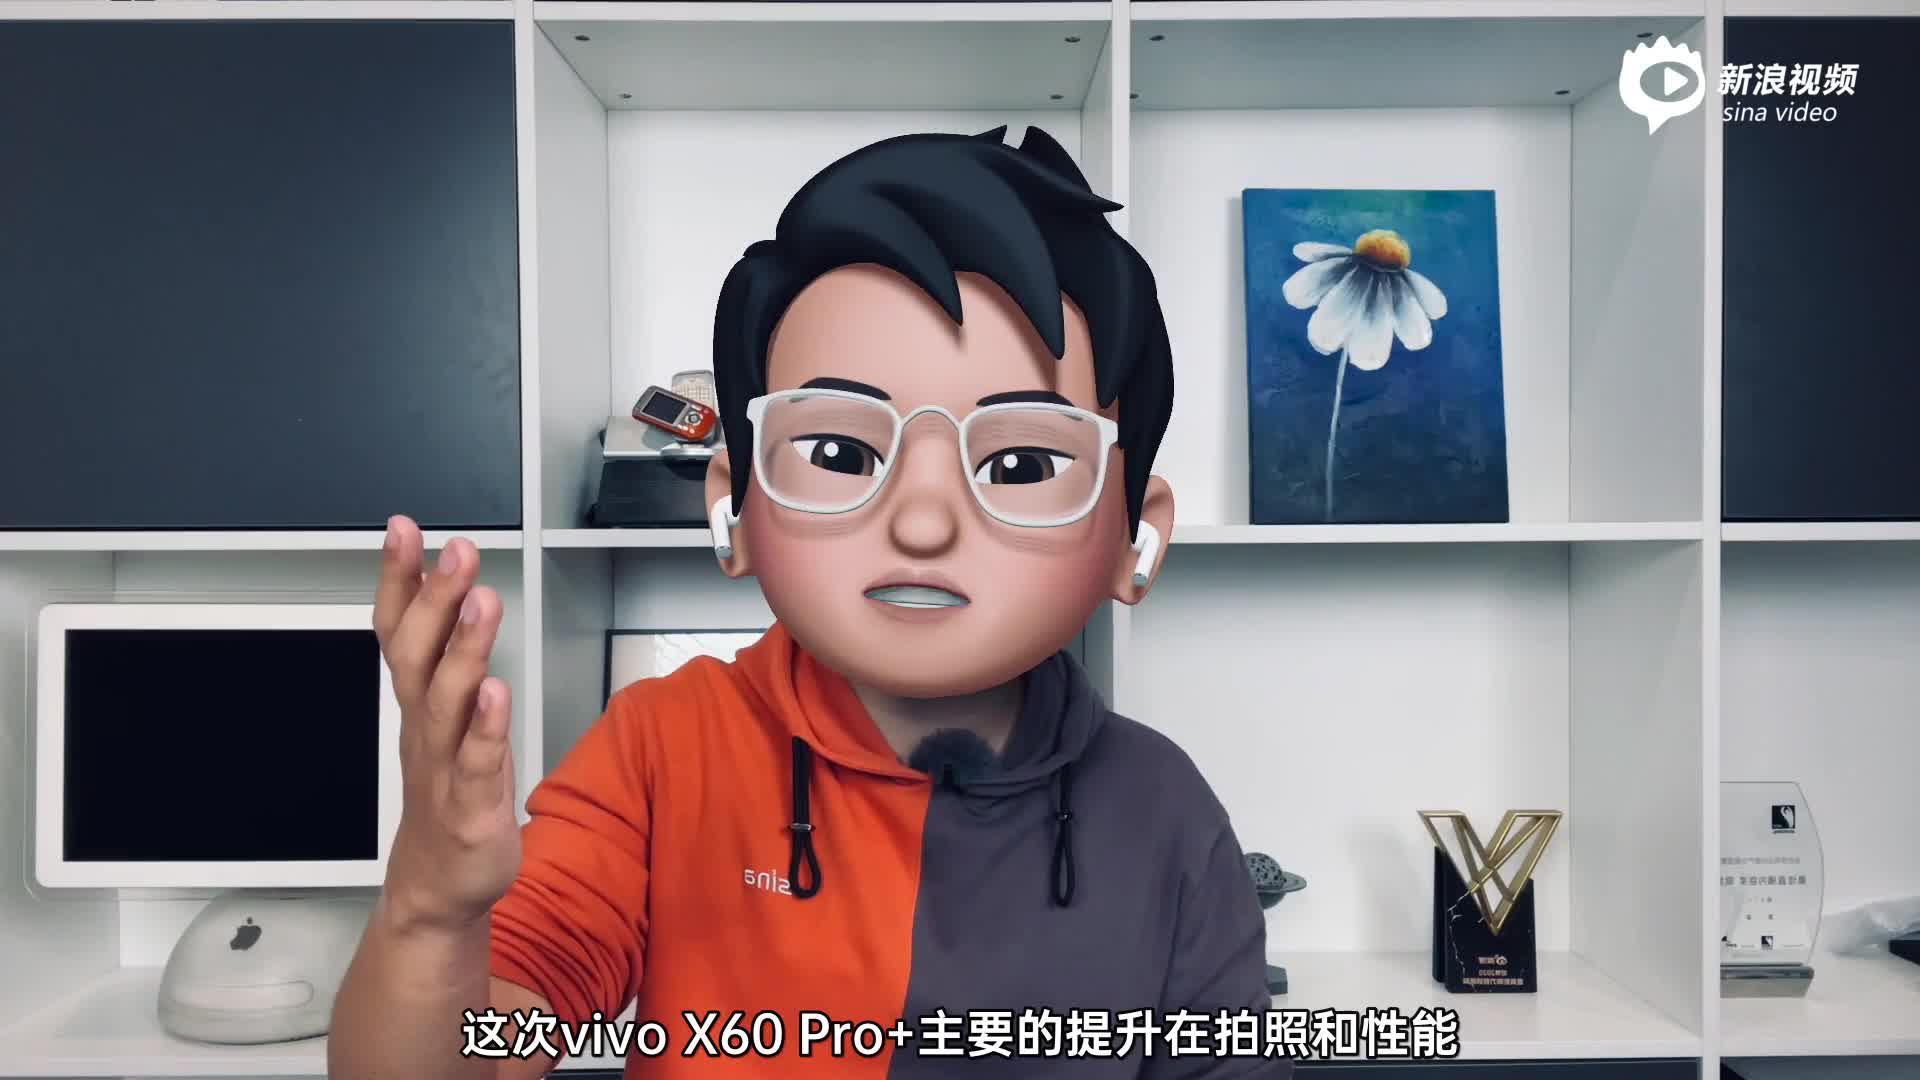 vivo X60 Pro 上手:超广角拍摄,稳了!